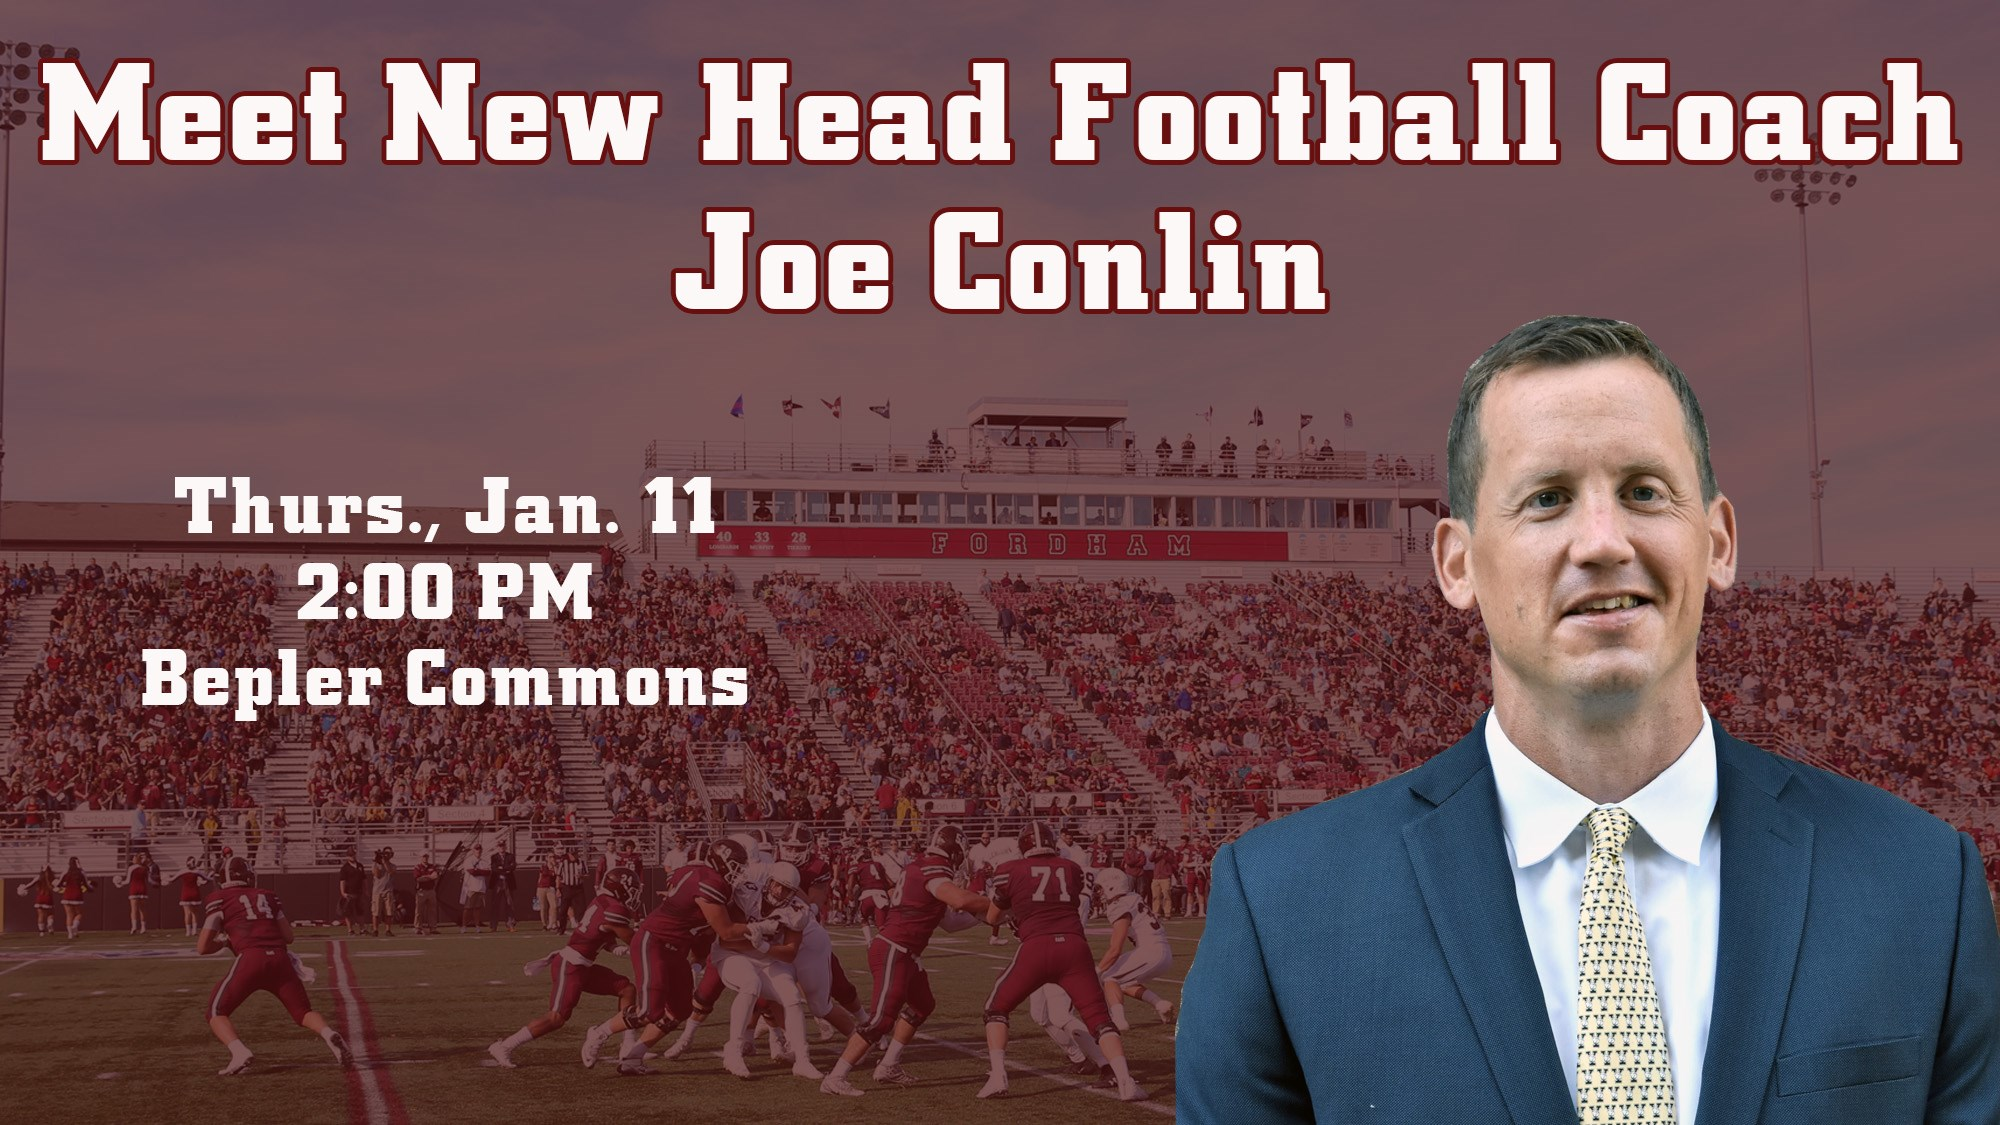 Meet New Fordham Head Football Coach Joe Conlin on Jan. 11